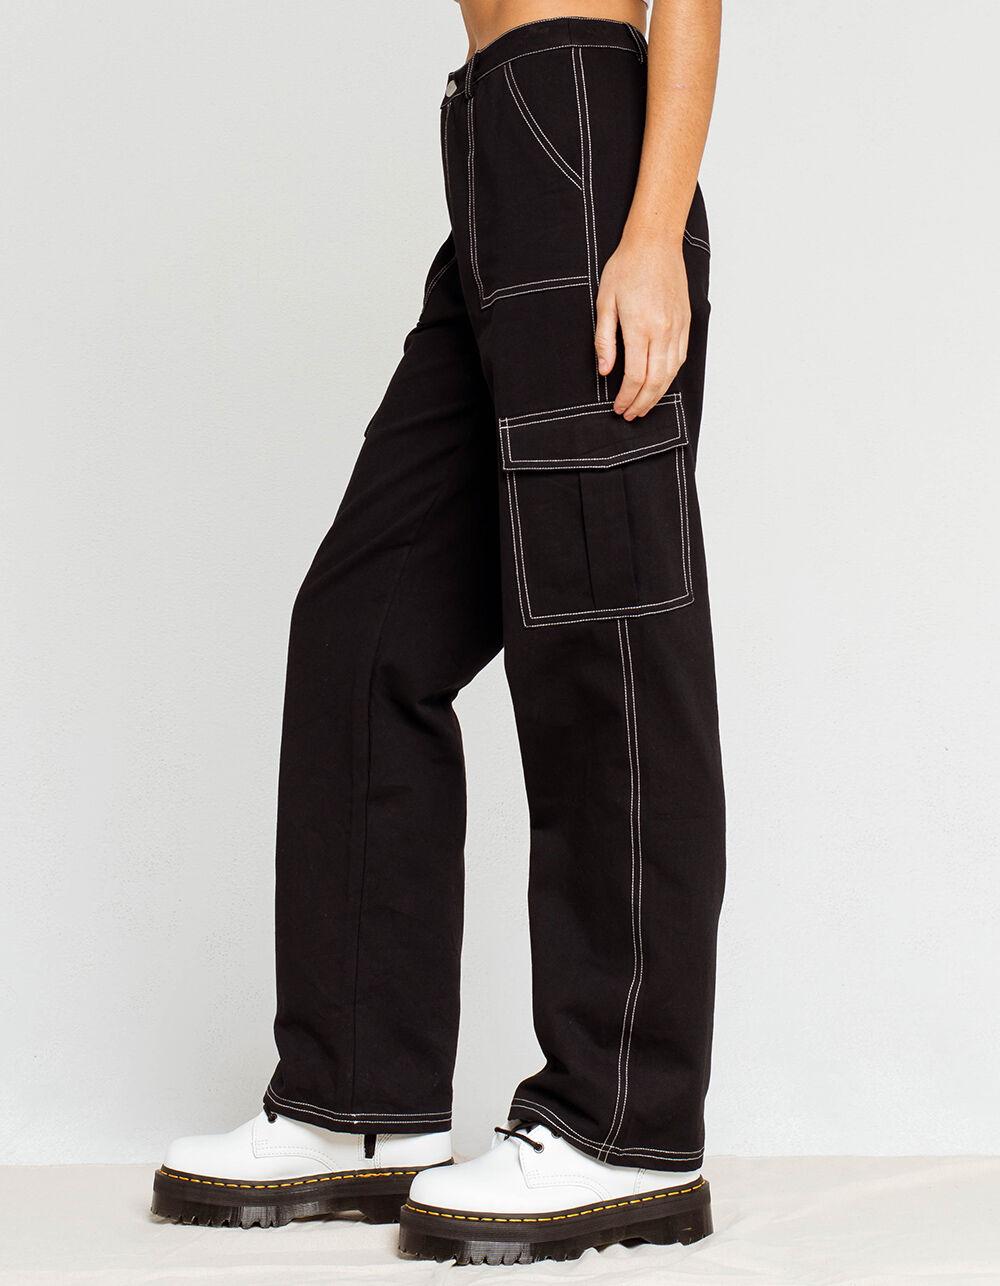 FULL TILT Contrast Stitch Womens Cargo Pants